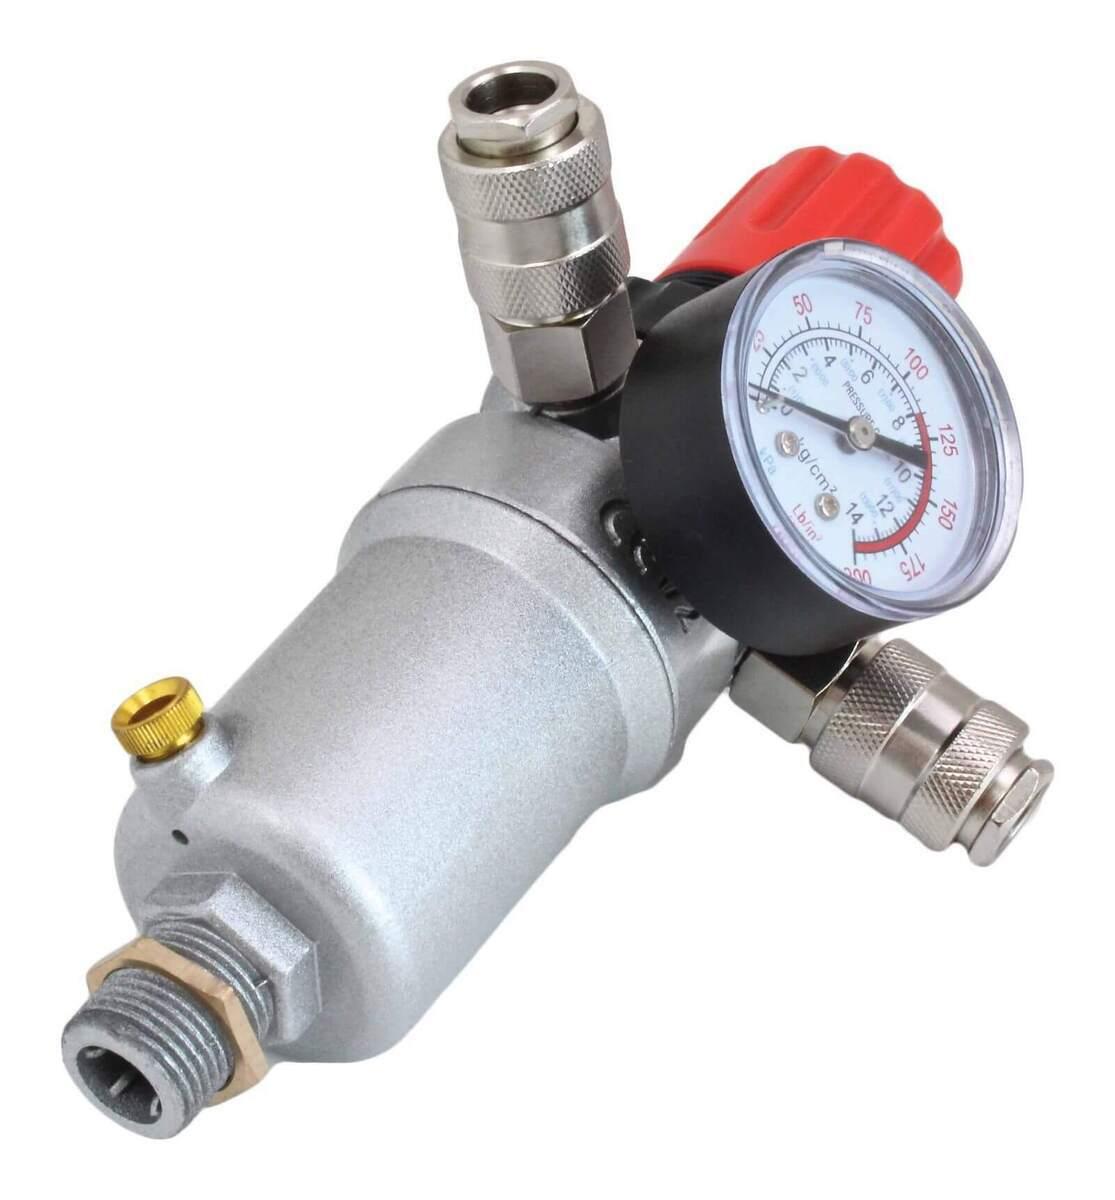 "Regulátor tlaku vzduchu - odlučovač vody 1/2"", max. 12 bar - ASTA"